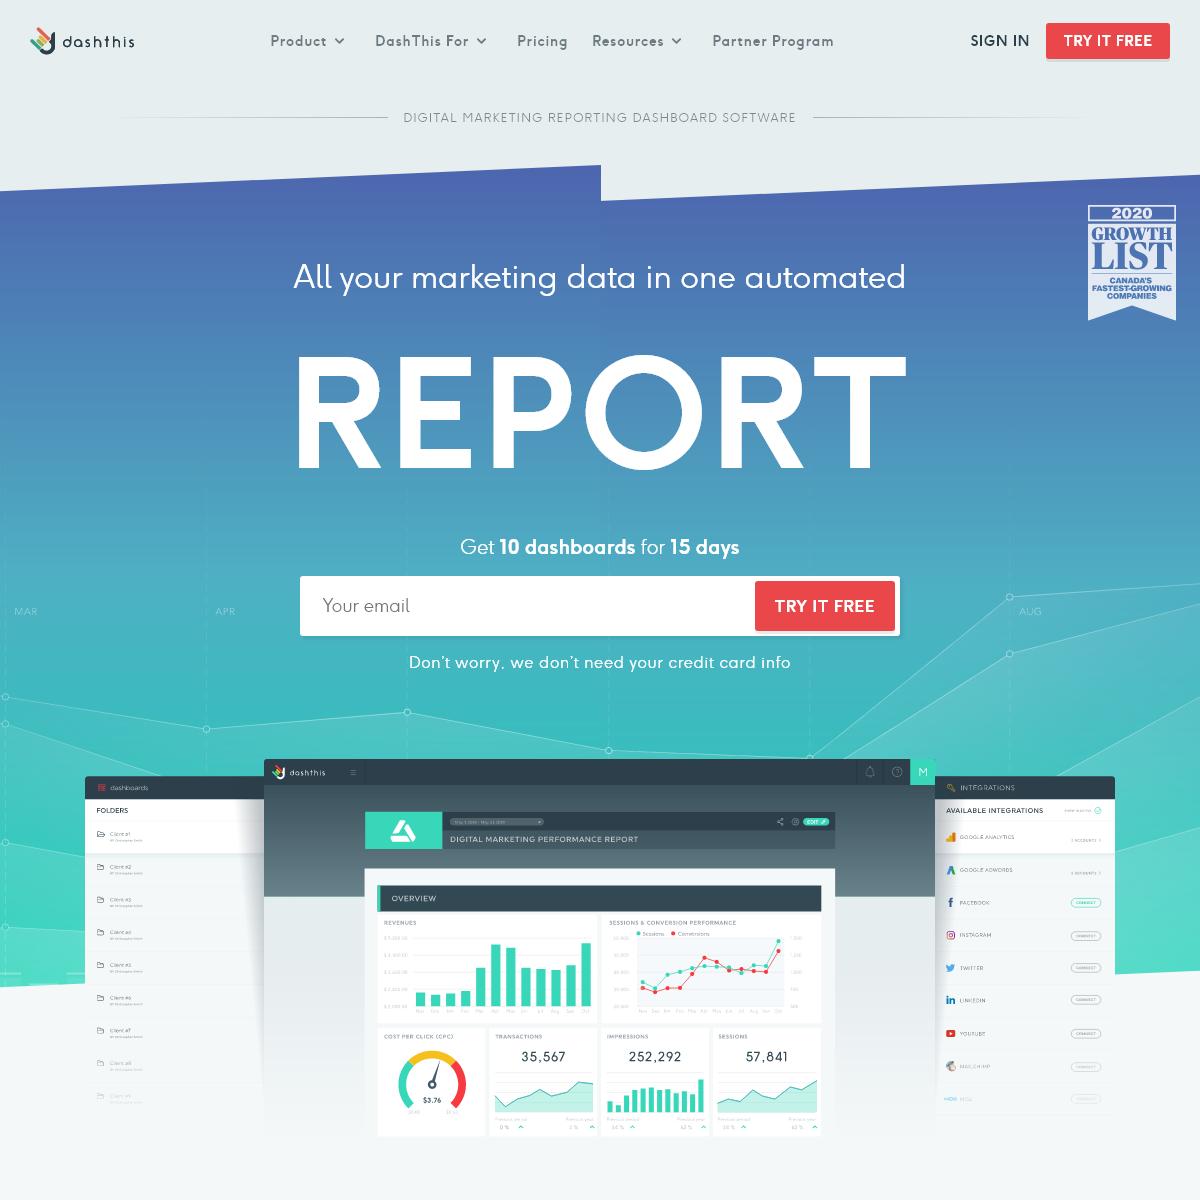 Marketing Reporting Dashboards For Analytics, SEM & SEO - DashThis